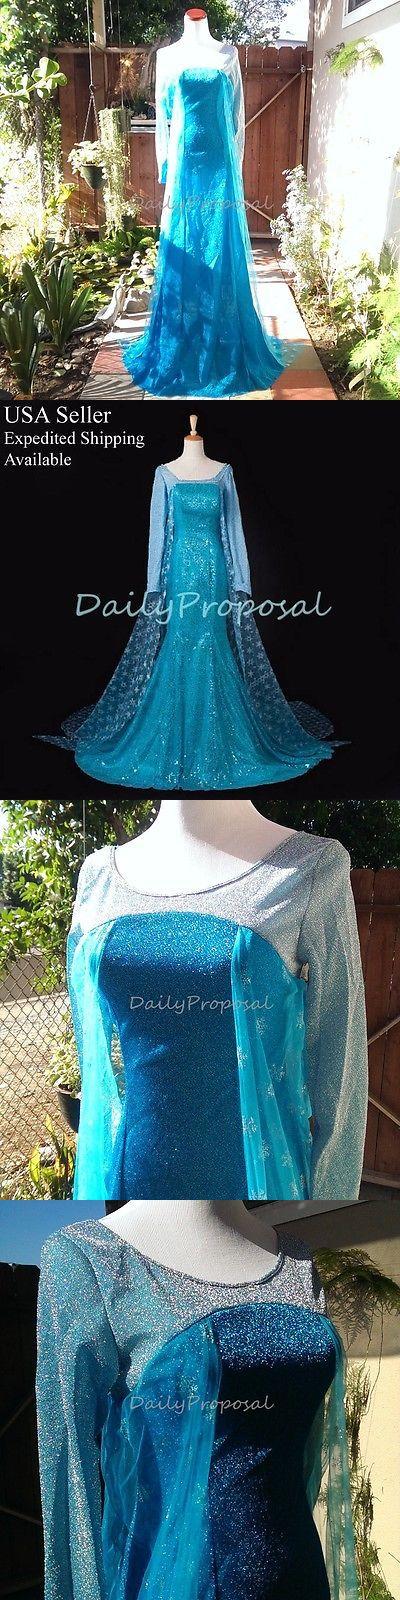 Halloween Costumes: Ae4 Adult Elsa Snow Queen Dress Frozen Disguise Costume Halloween Cosplay X-Xxl BUY IT NOW ONLY: $34.95